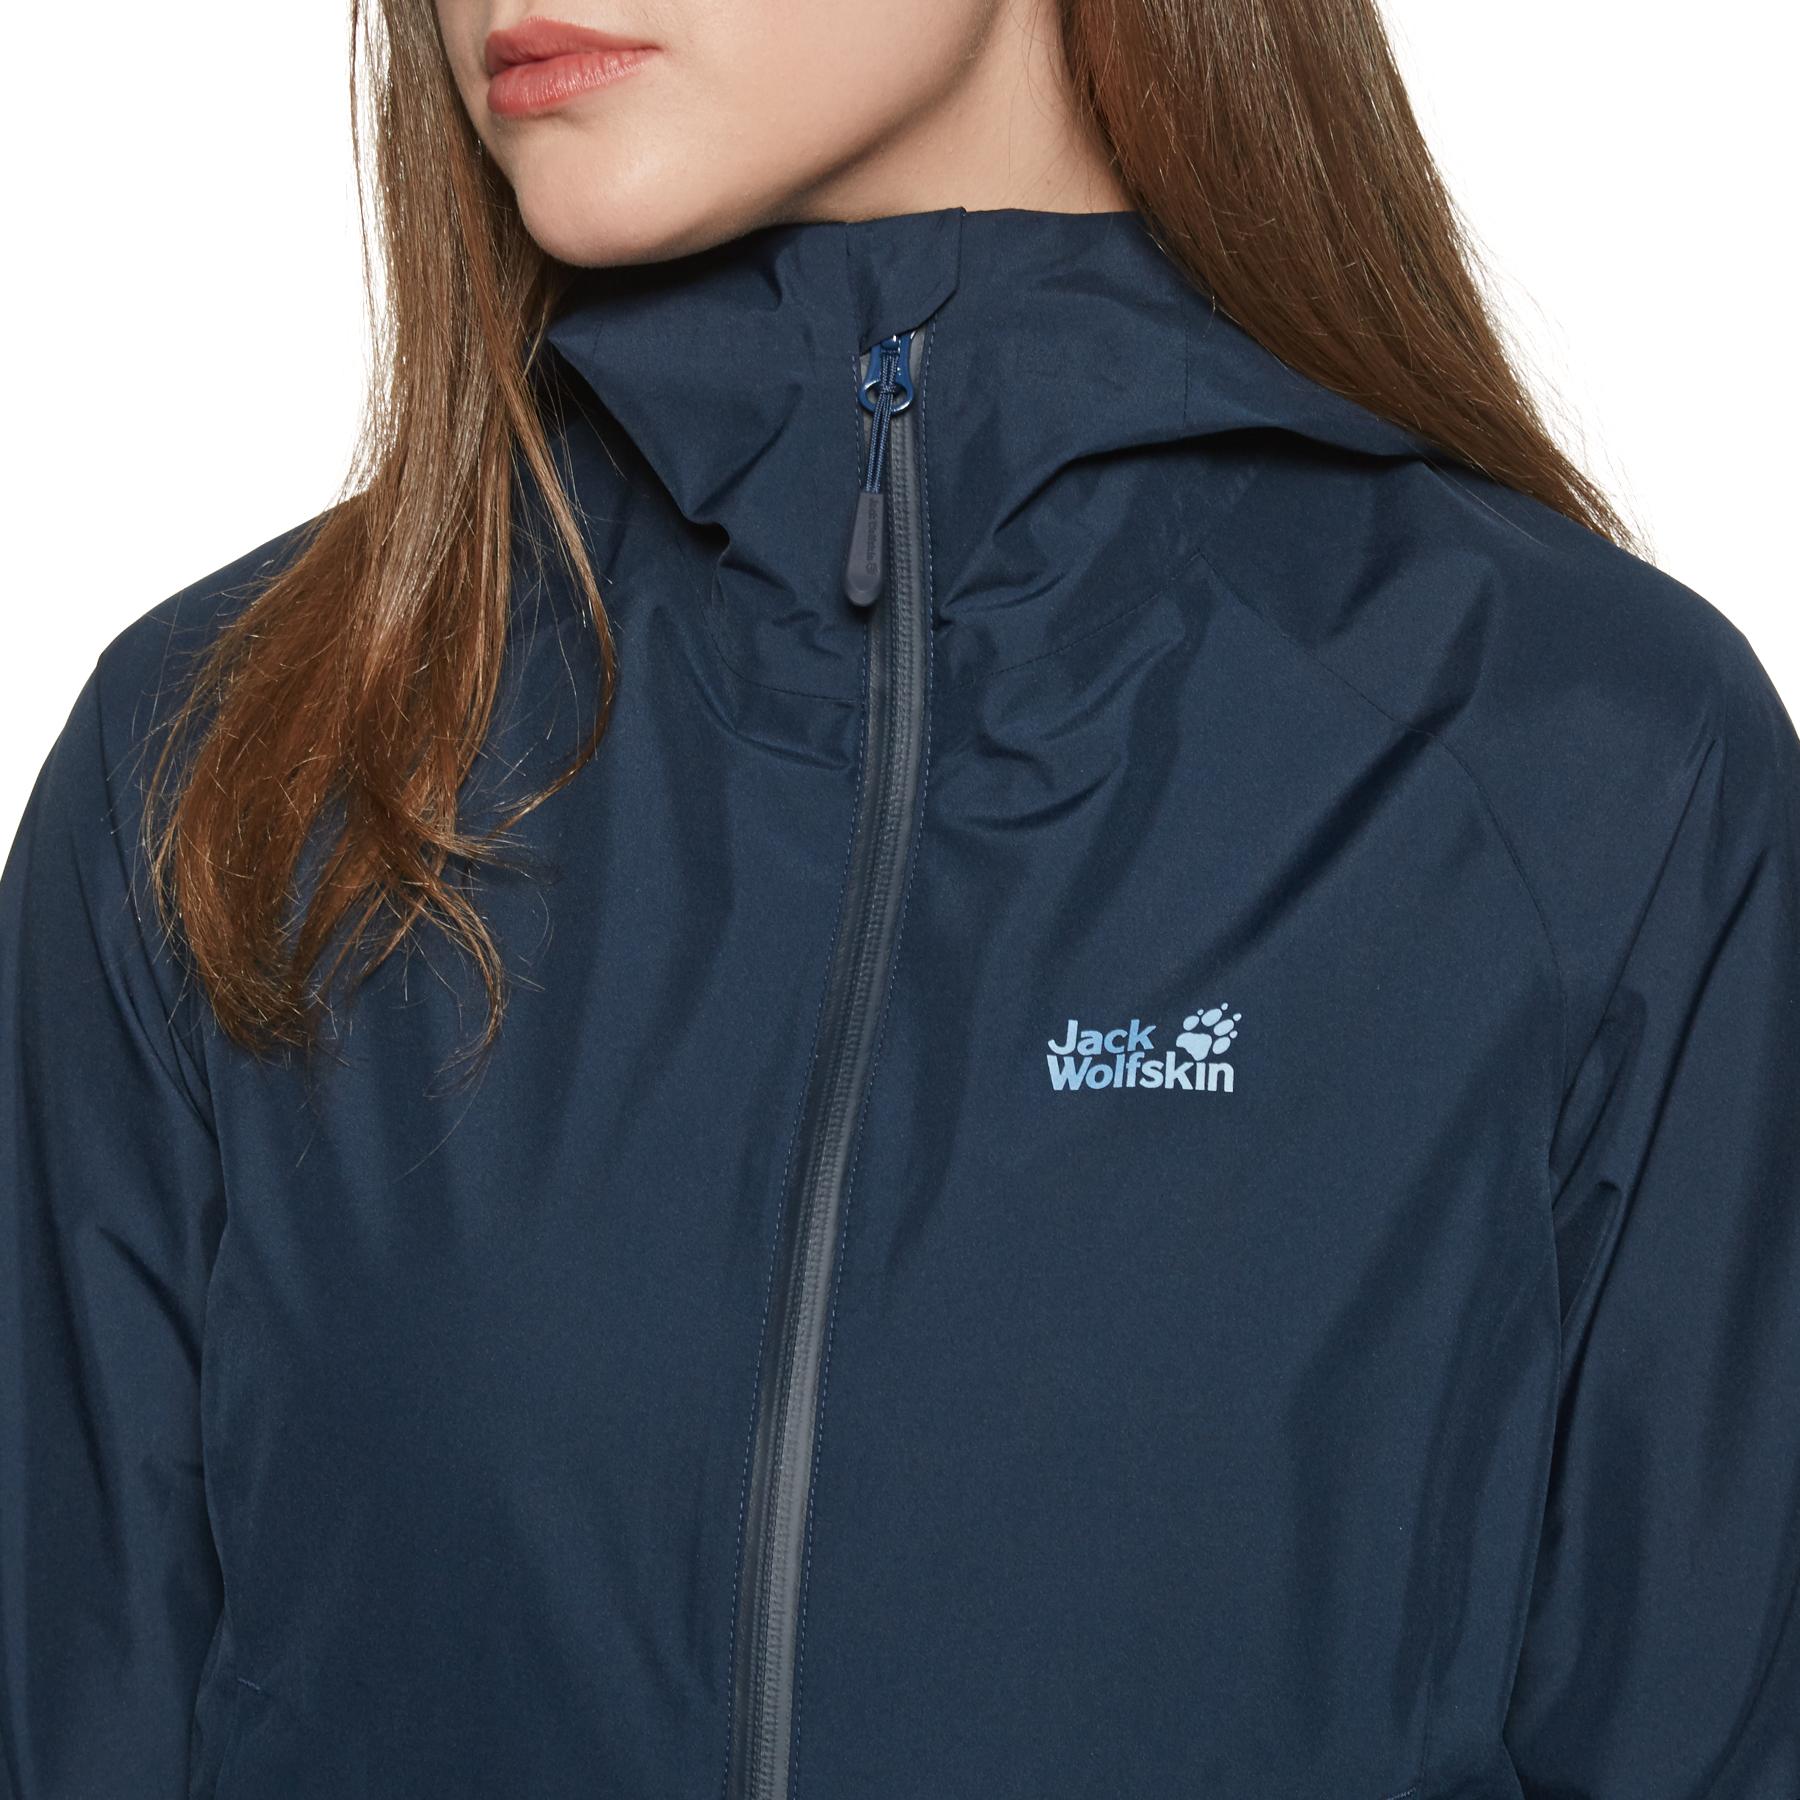 Jack Wolfskin Scenic Trail Jacket Damen midnight blue |